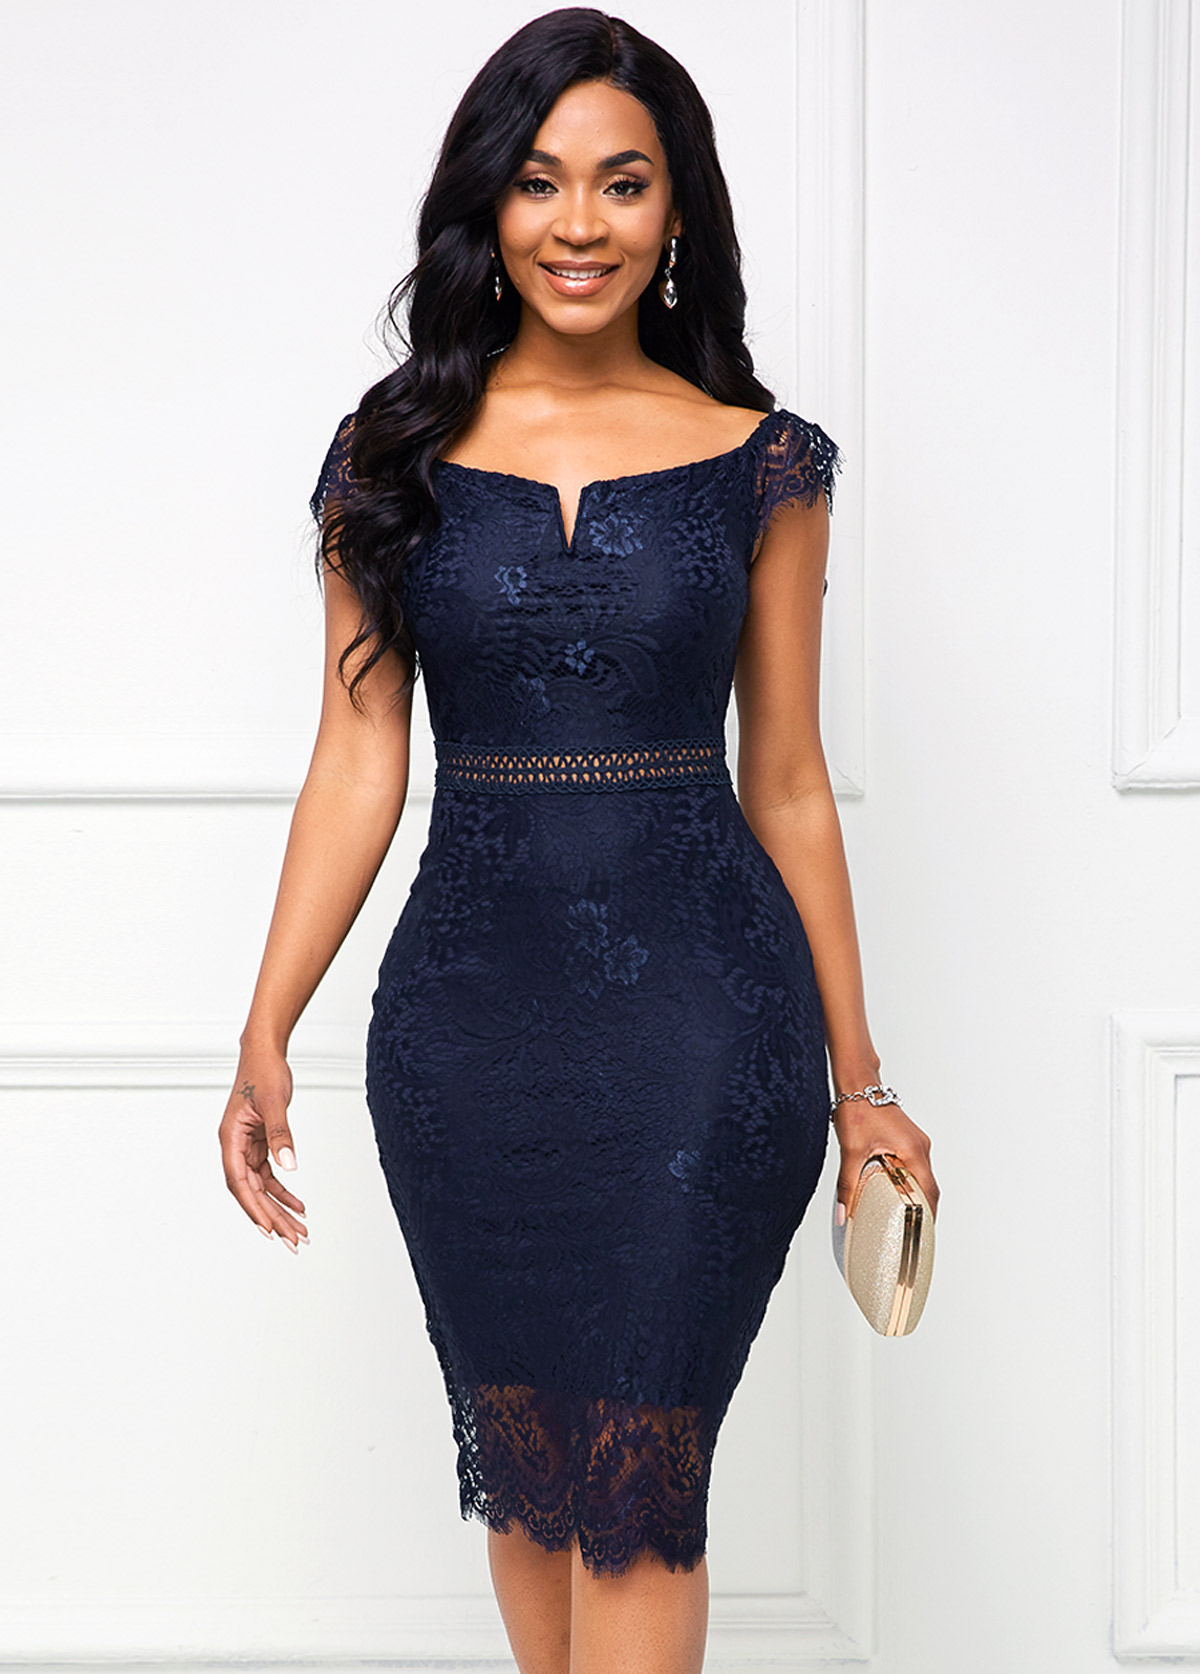 Cap Dress Lace Navy Blue Bodycon Dress